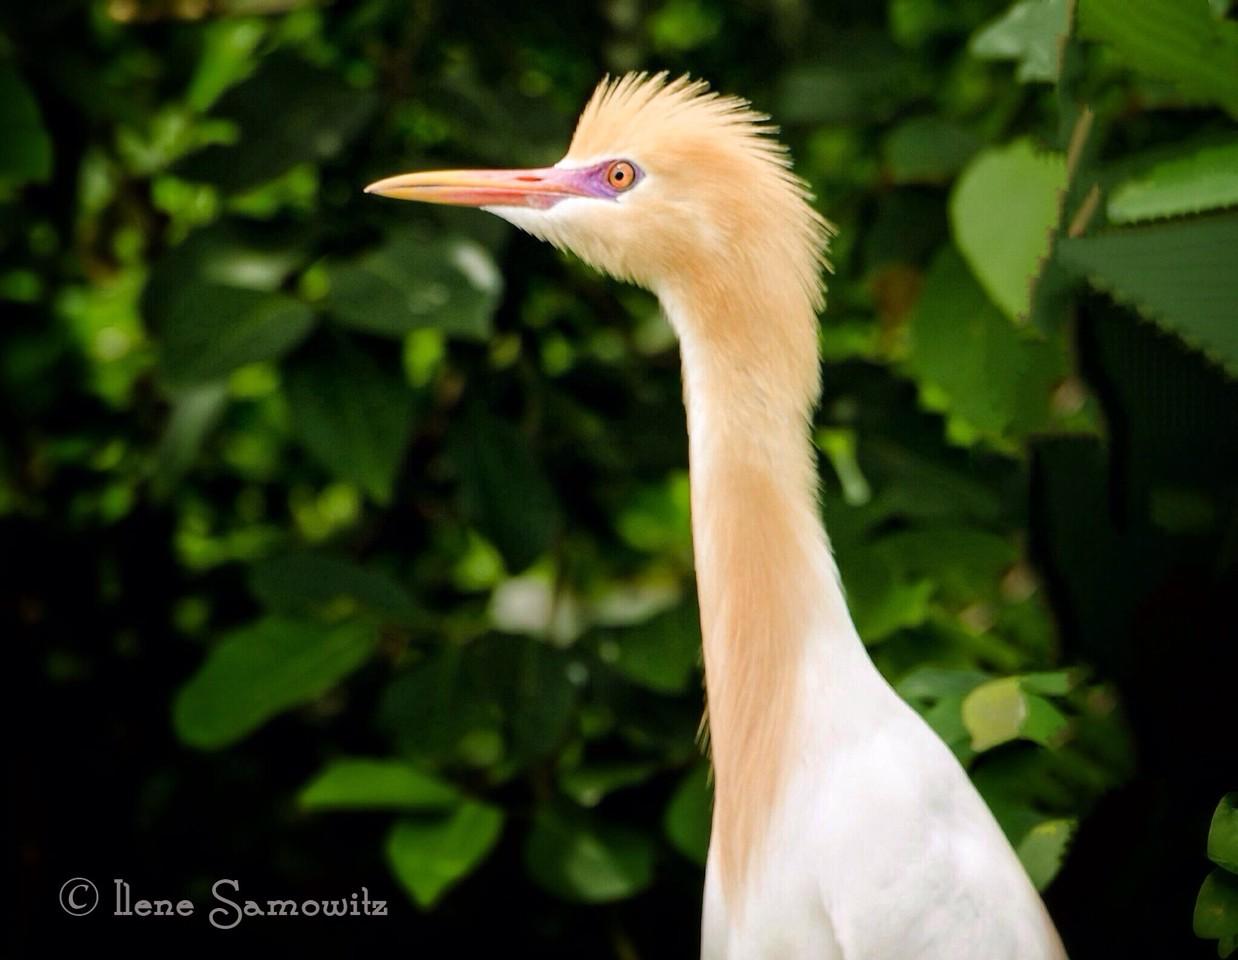 Portrait of Cattle Egret found in the Ranganthittu Bird Sanctuary outside of Mysore, India